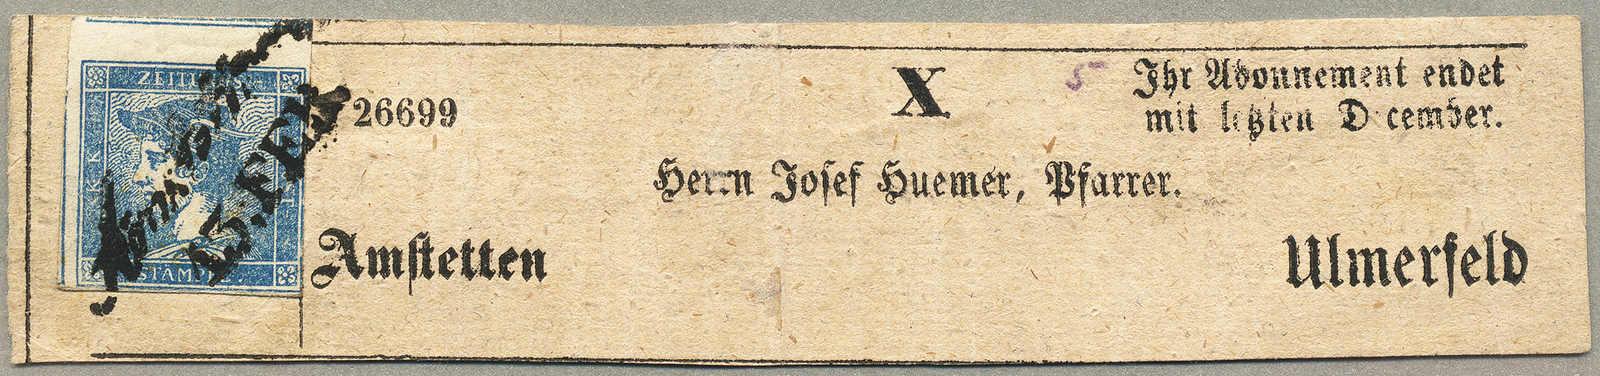 Lot 10474 - europa österreich -  classicphil GmbH 7'th classicphil Auction - Day 1